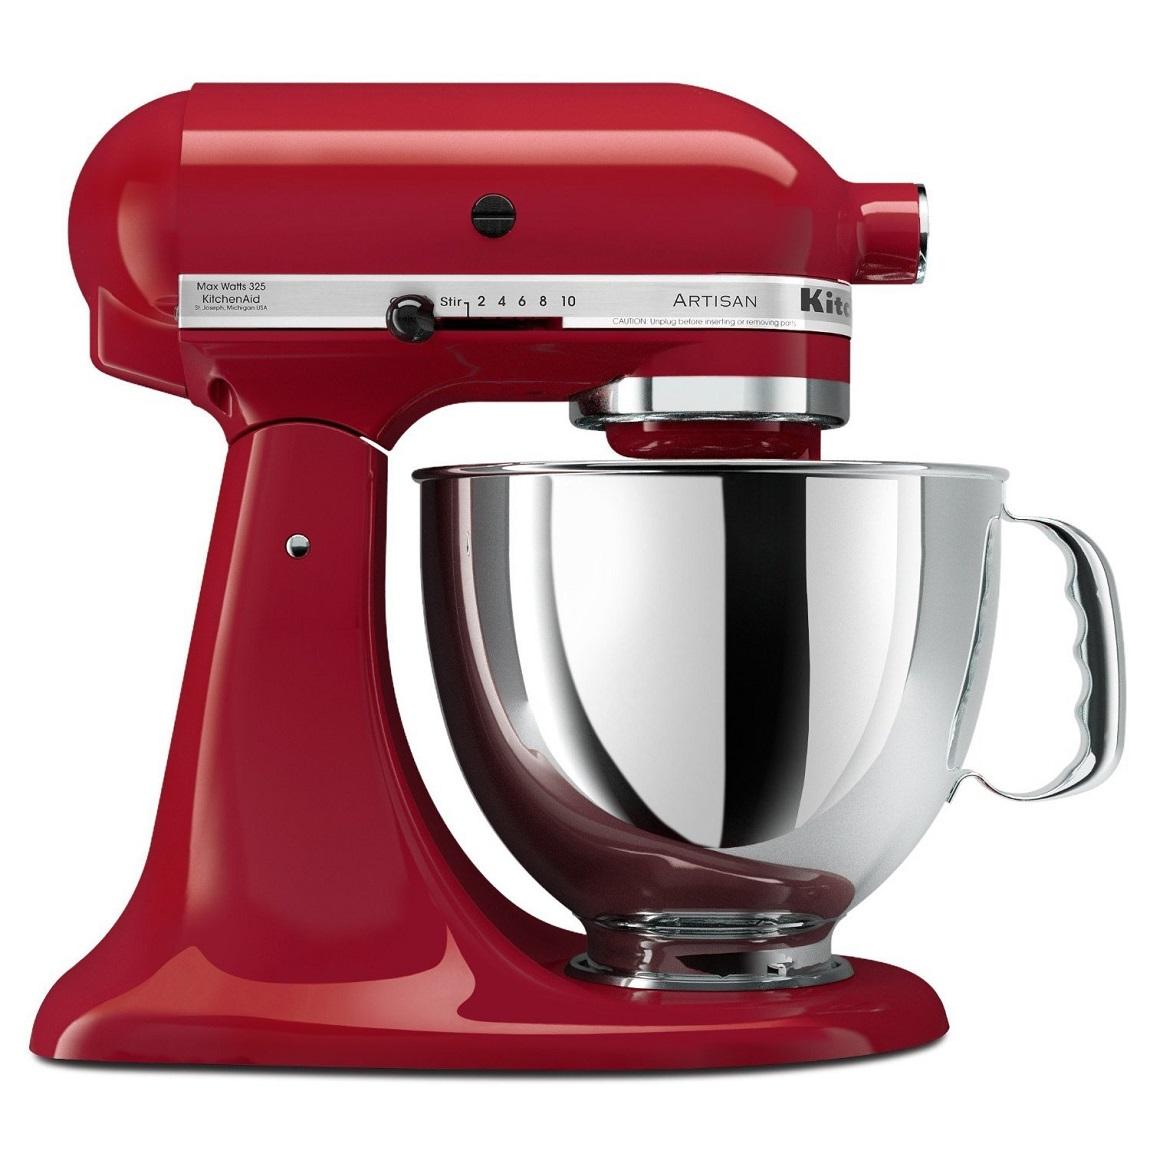 kitchenaid 5ksm150psber artisan stand mixer 4 8 litre bowl tilt head